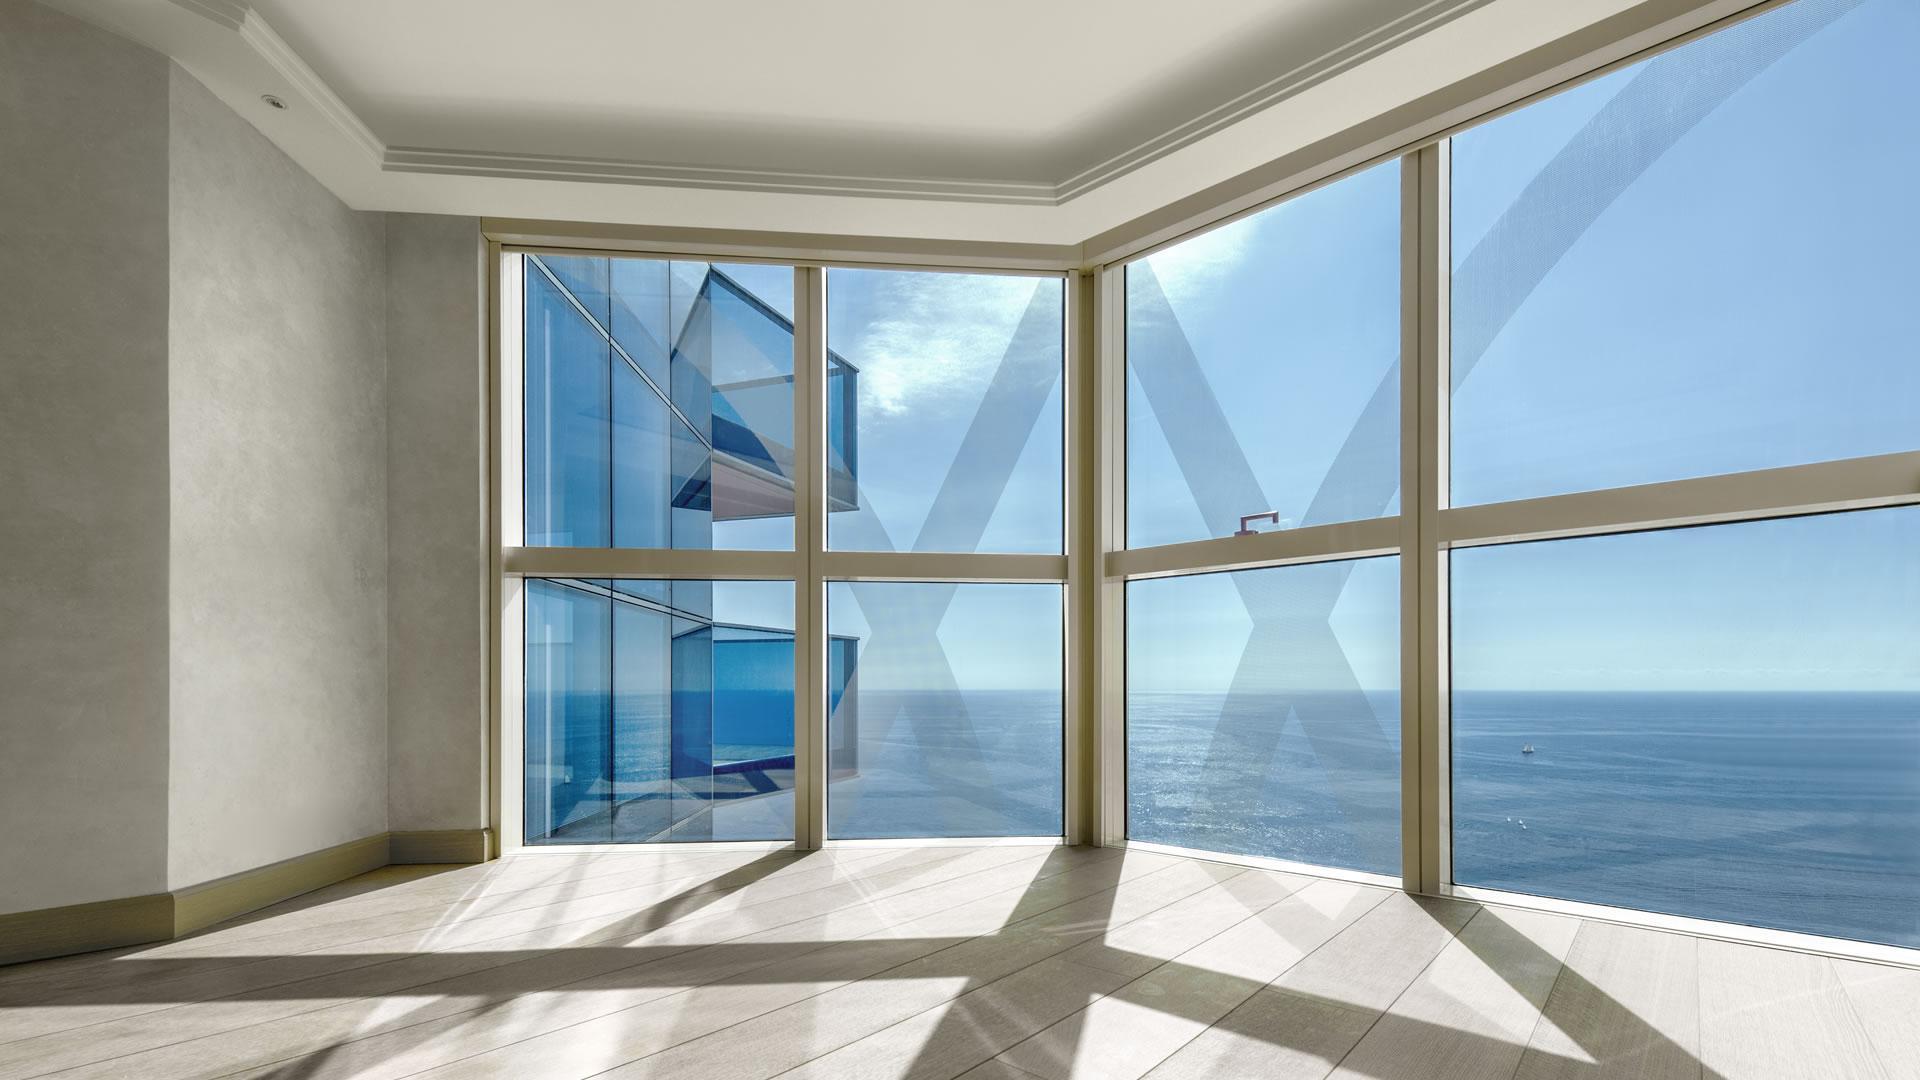 Tour Odéon, an Exceptional Architectural Masterpiece